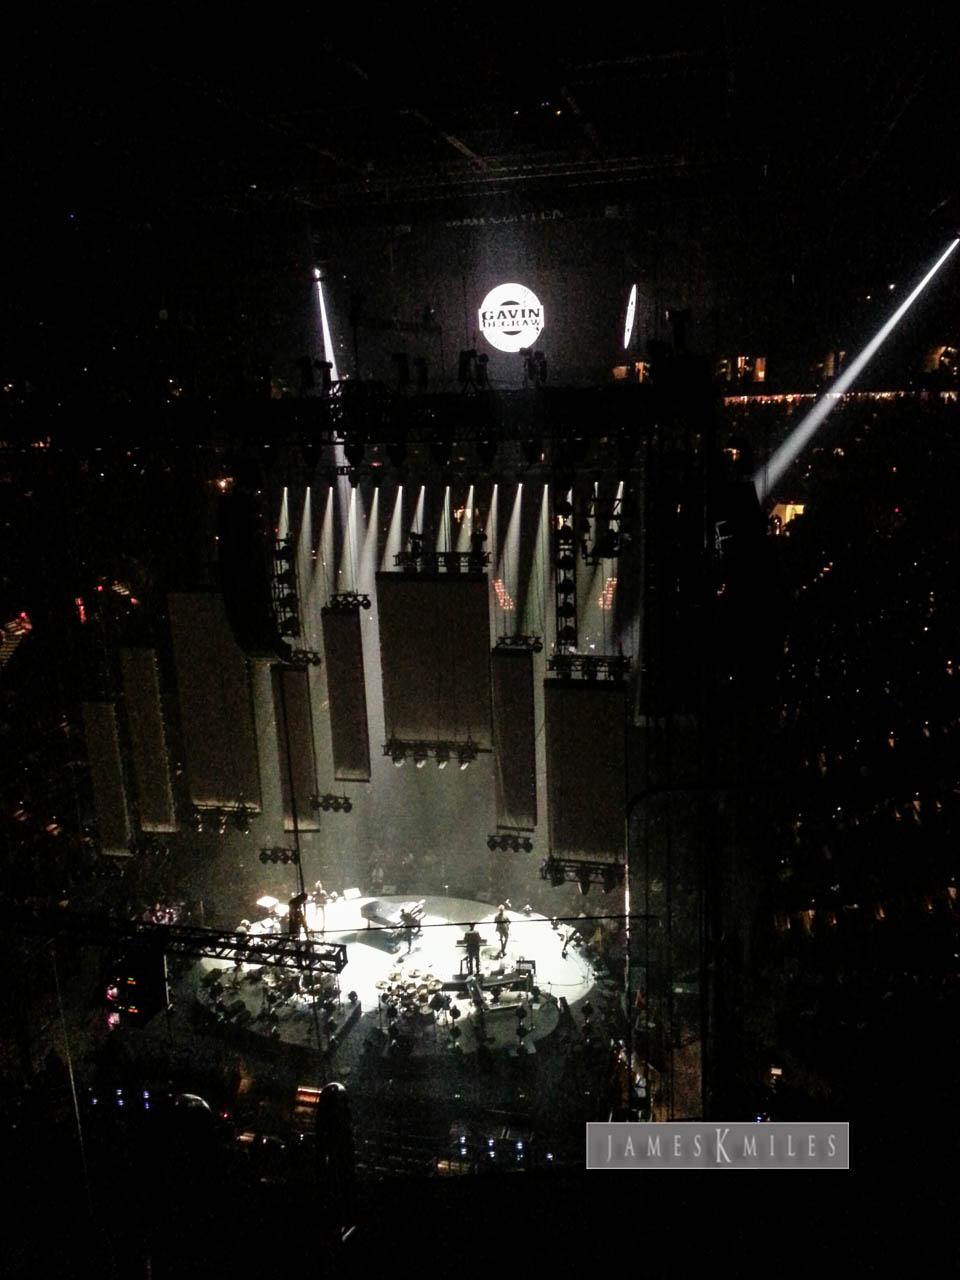 Billy Joel Concert Ft. Lauderdale